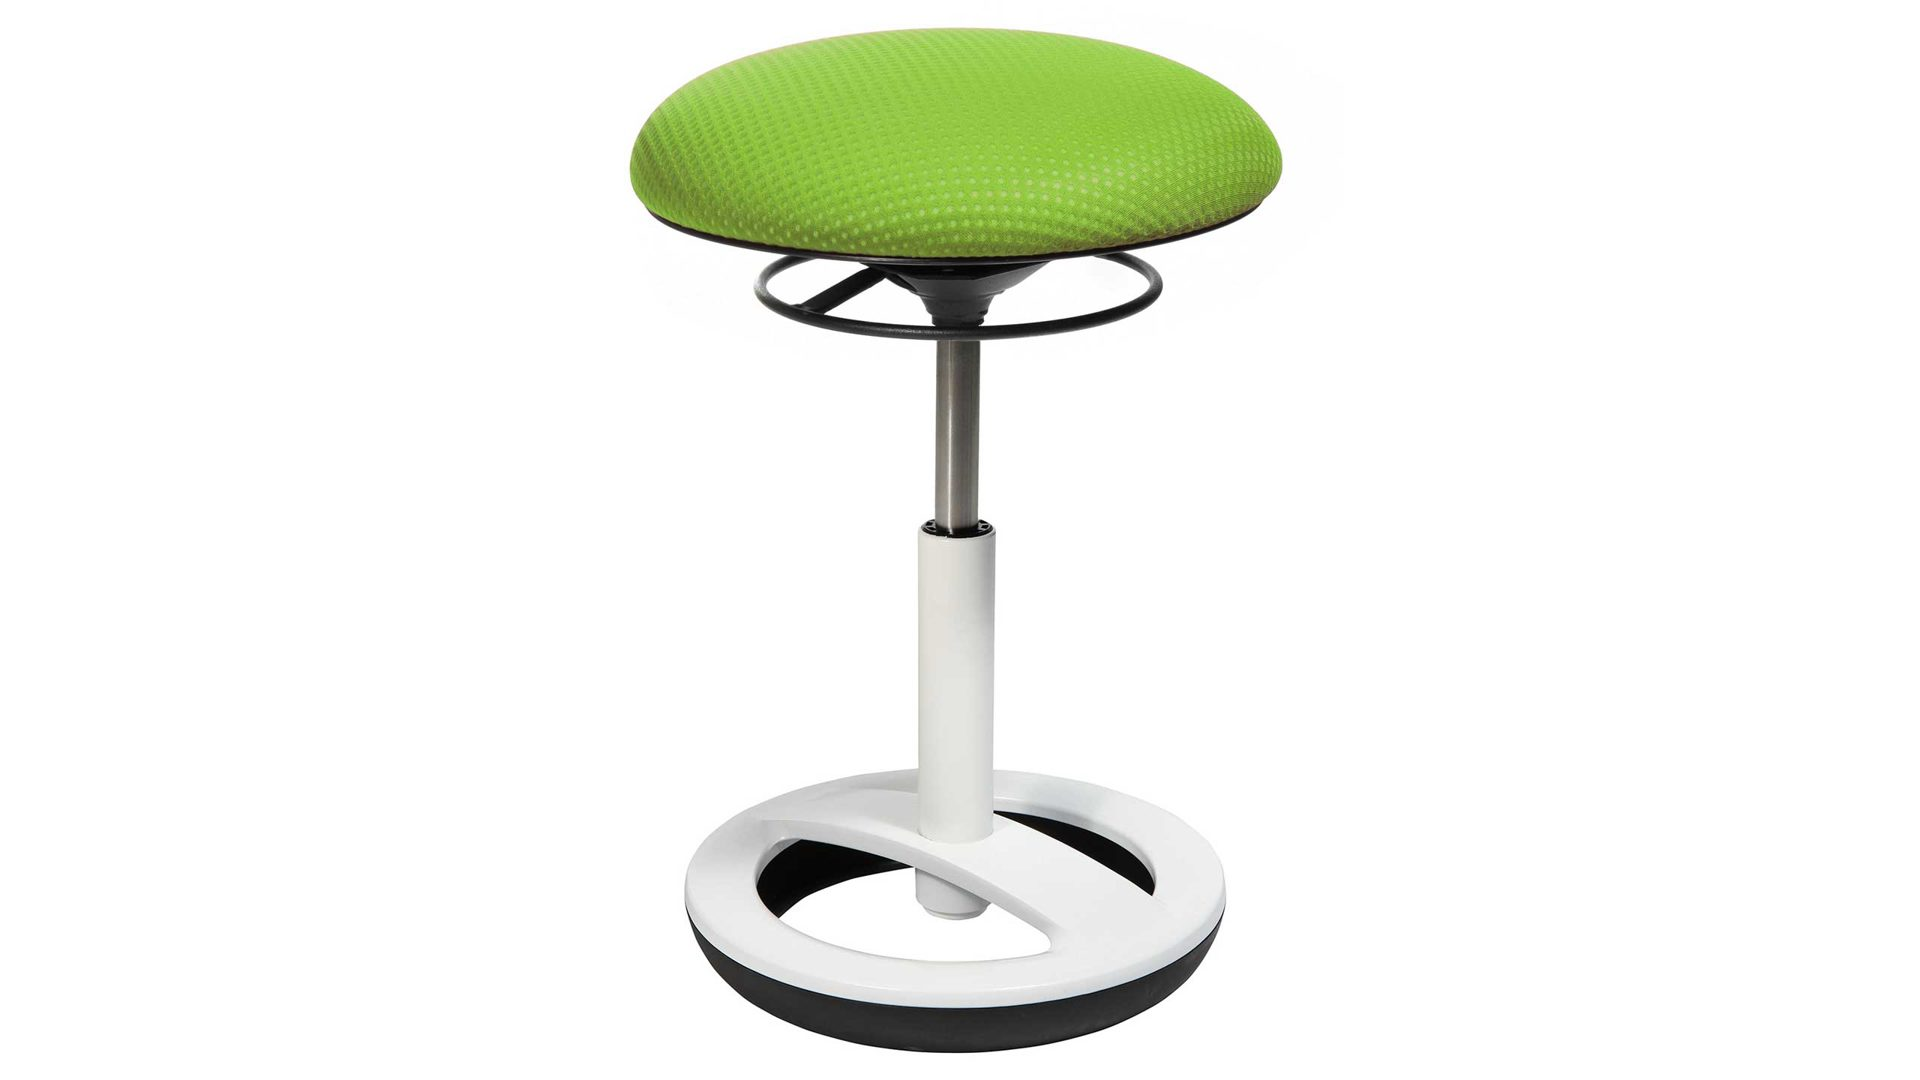 Sitzhocker wei trendy eleganter hocker sitzhocker plastik